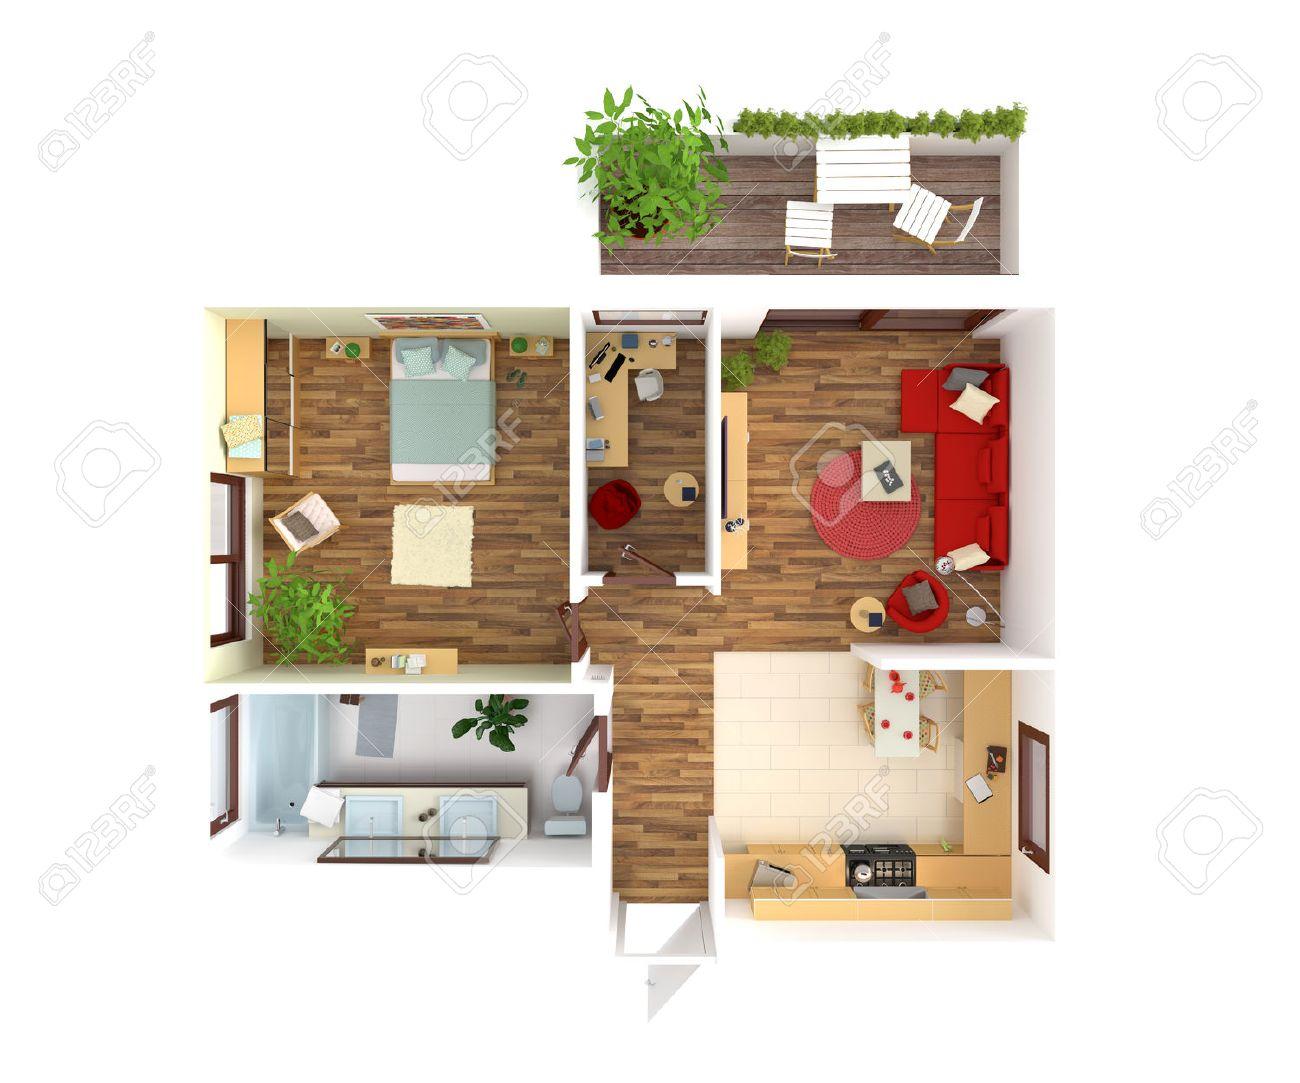 Planvy av en lägenhet: kök, matsal, vardagsrum, sovrum, hall ...